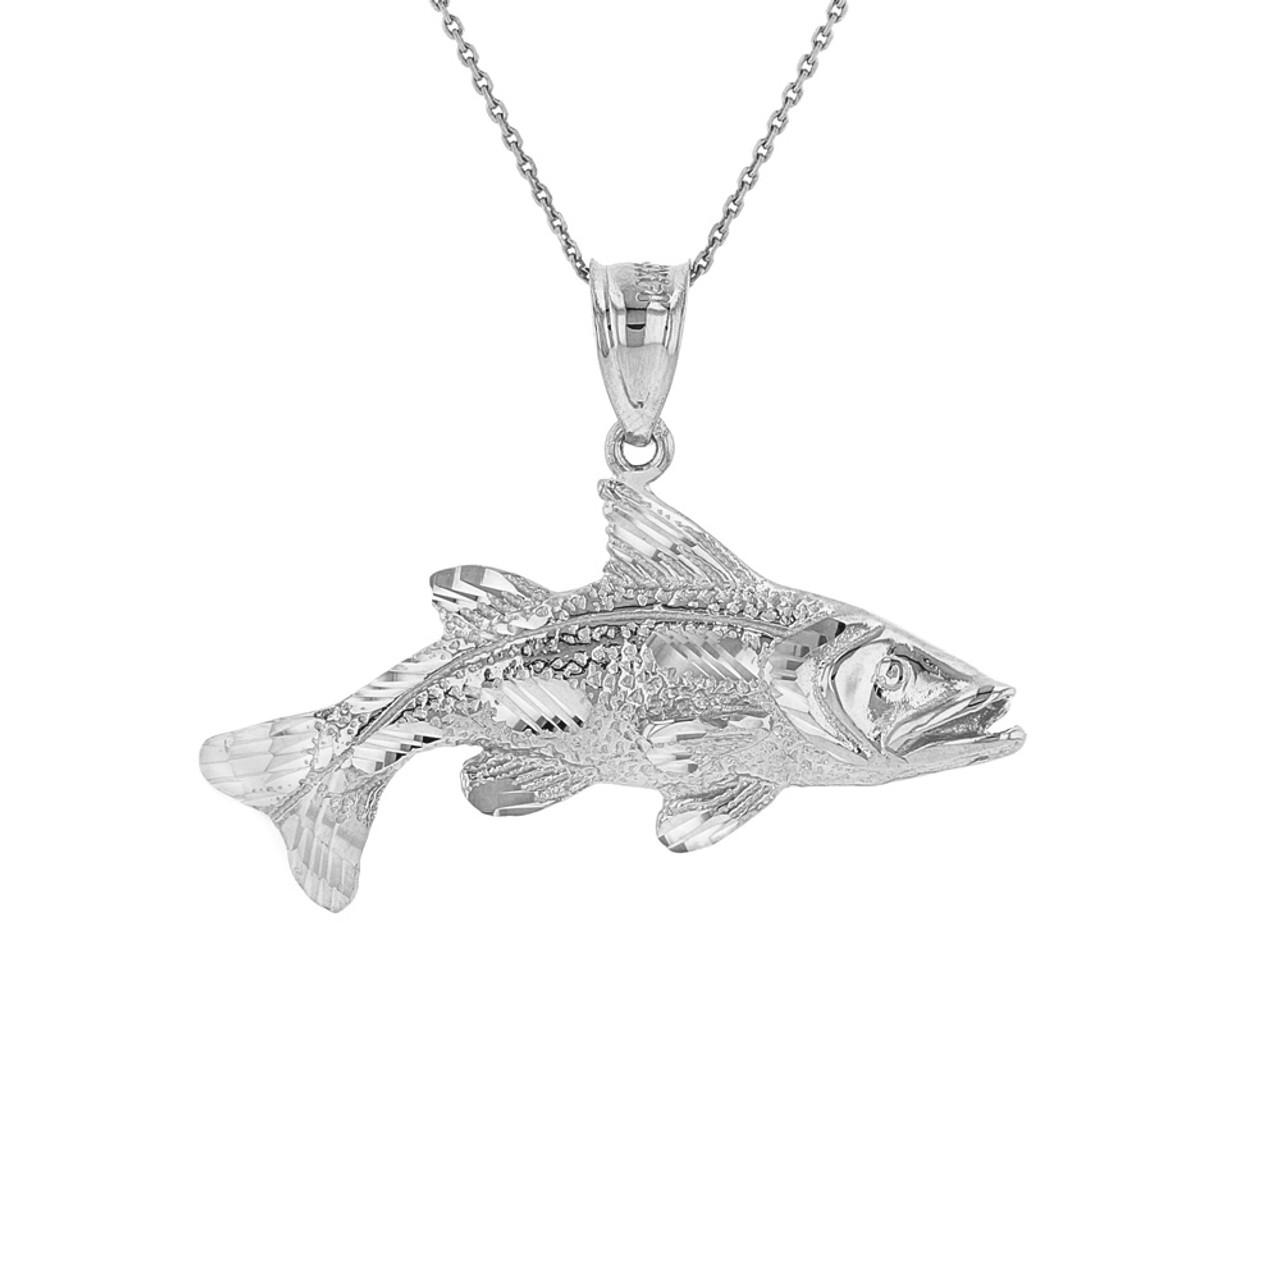 Sterling silver diamond cut largemouth bass fish pendant necklace aloadofball Image collections